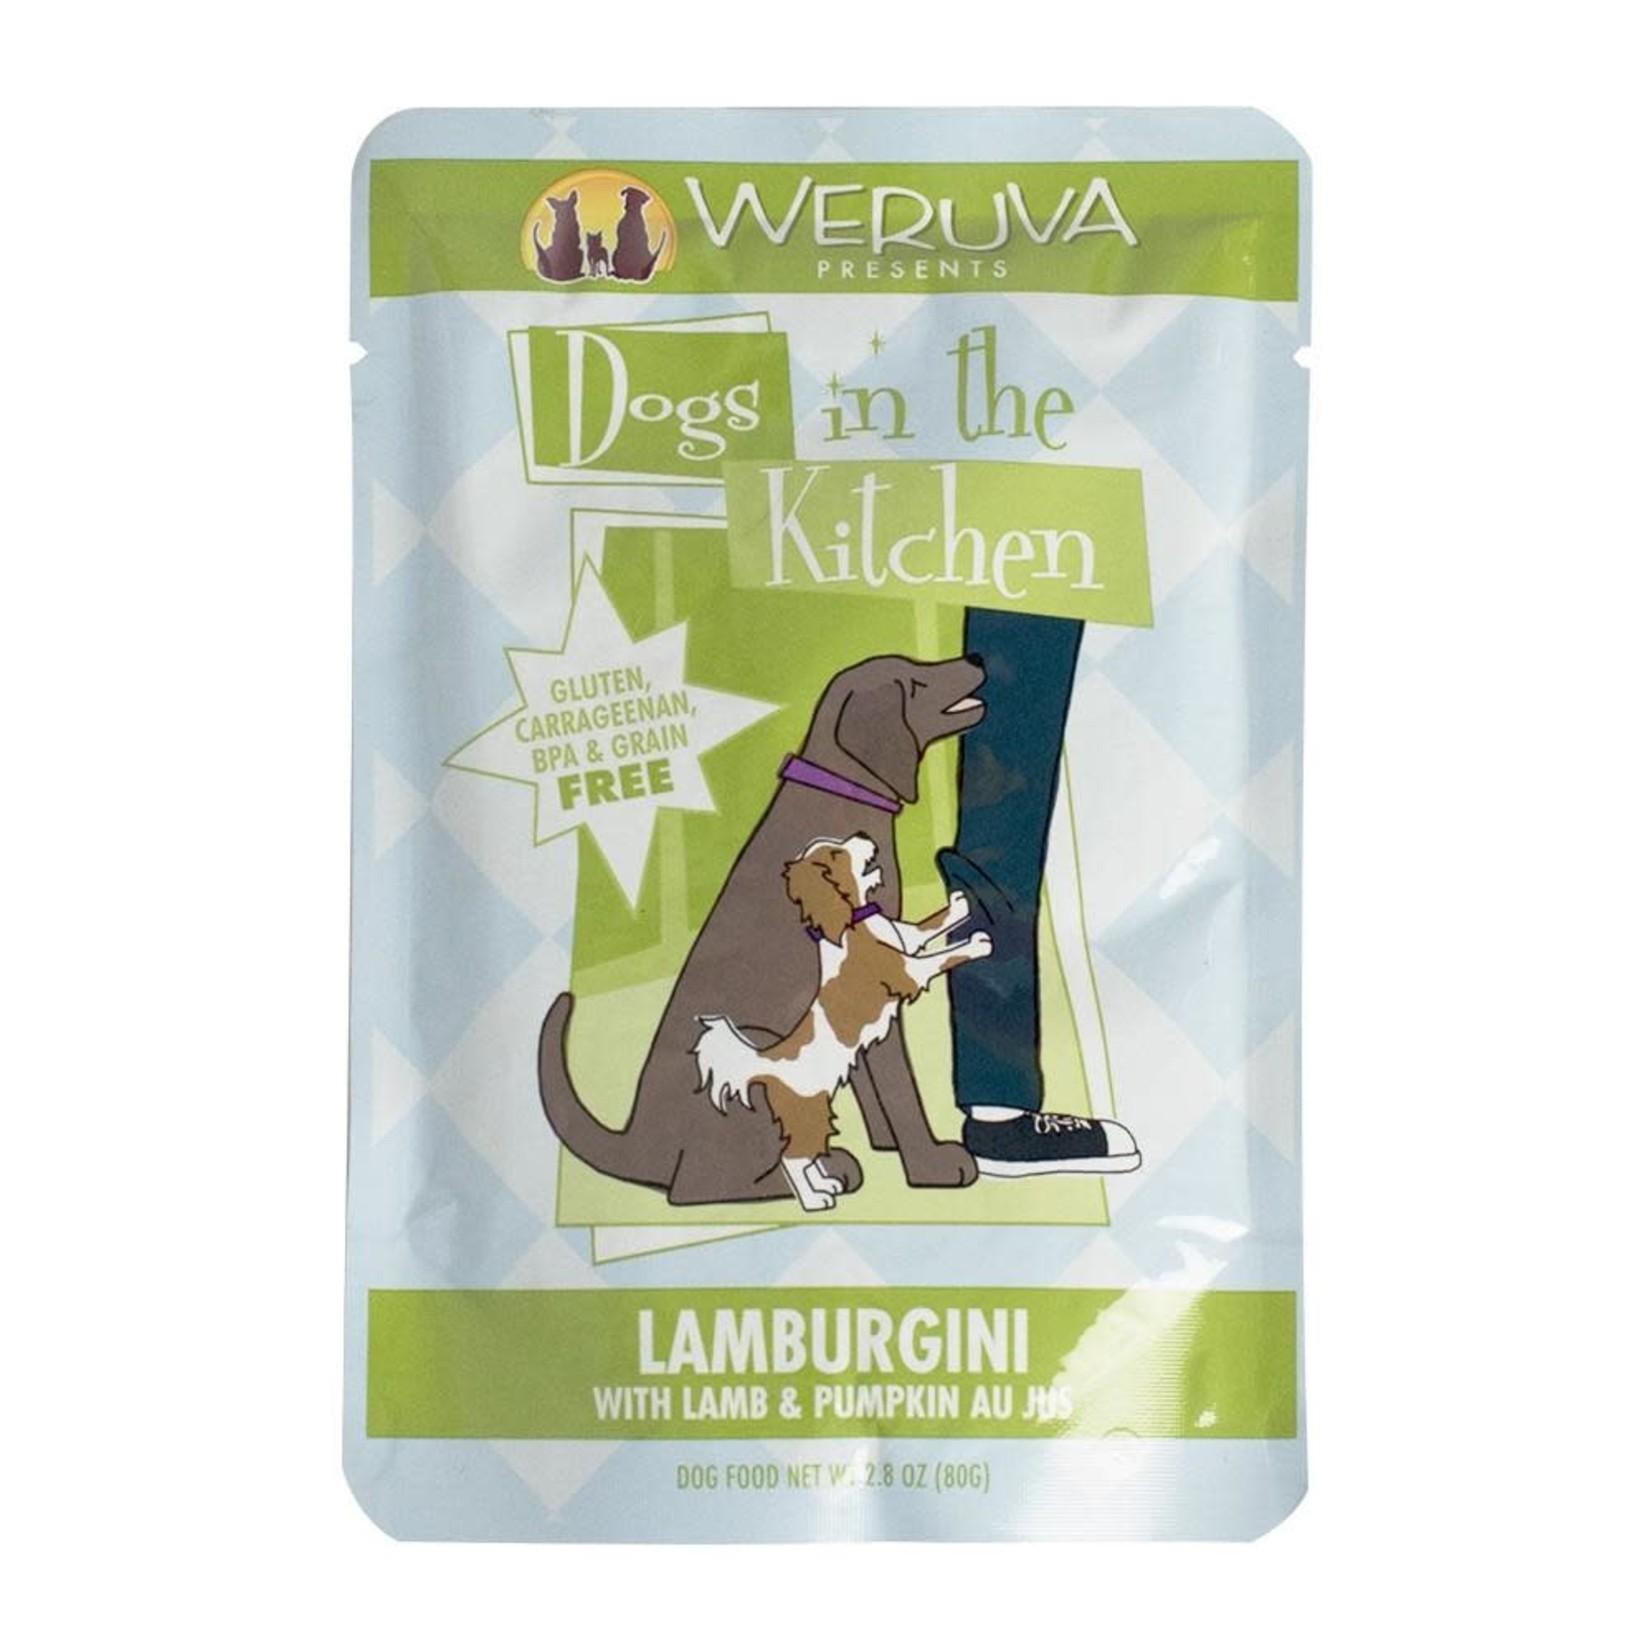 Weruva Weruva Lamburgini Dog Food 2.8oz Pouch